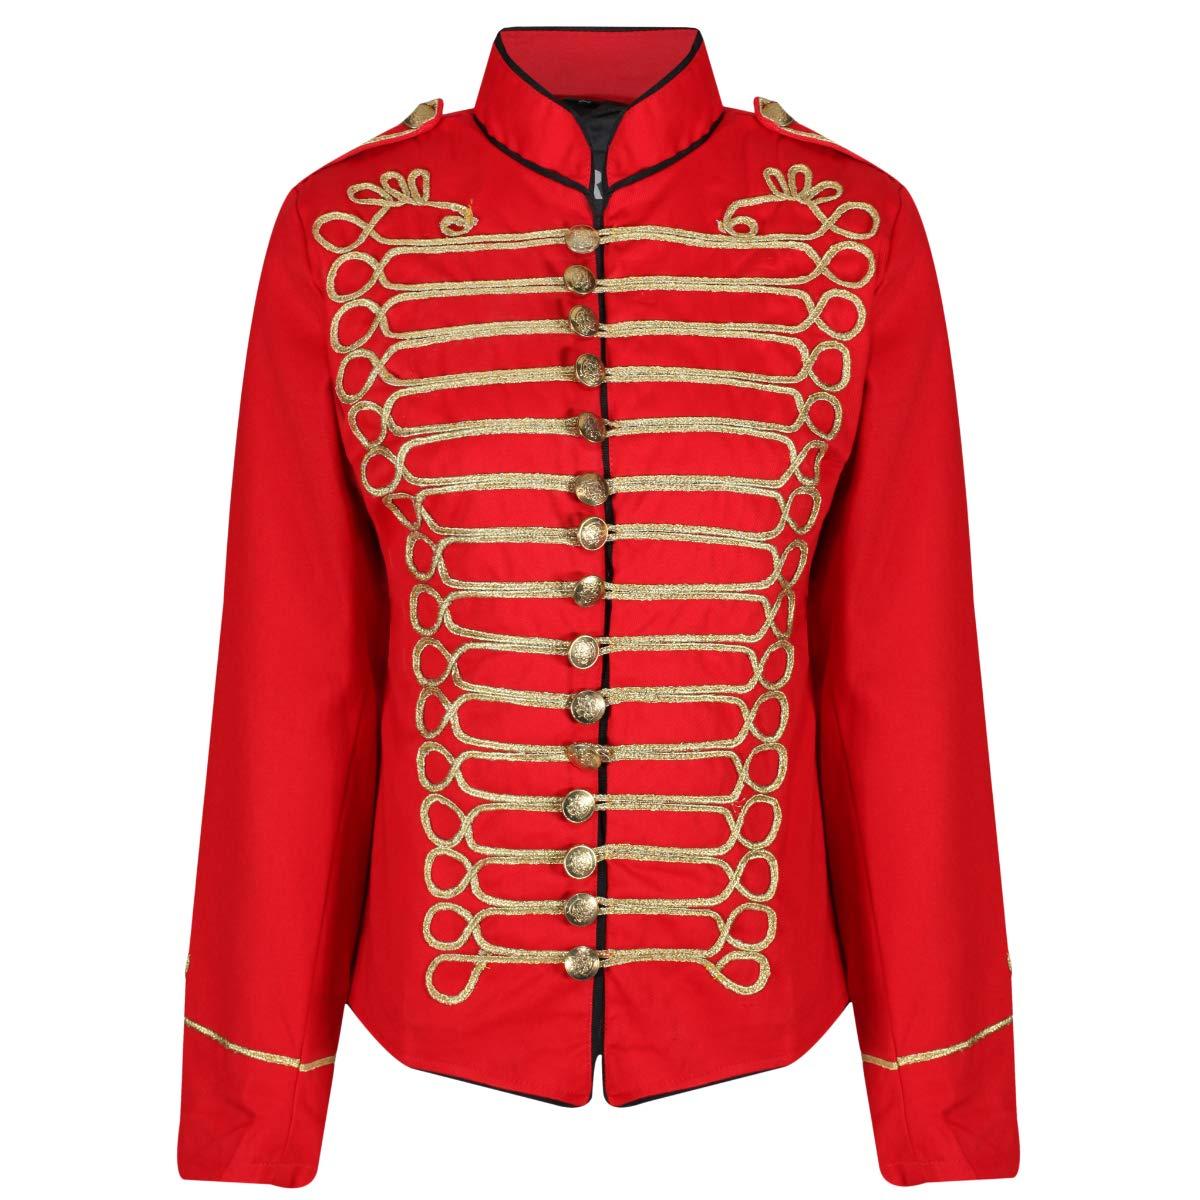 Ro Rox Ladies Emo Punk Goth Napoleon Military Drummer Parade Jacket